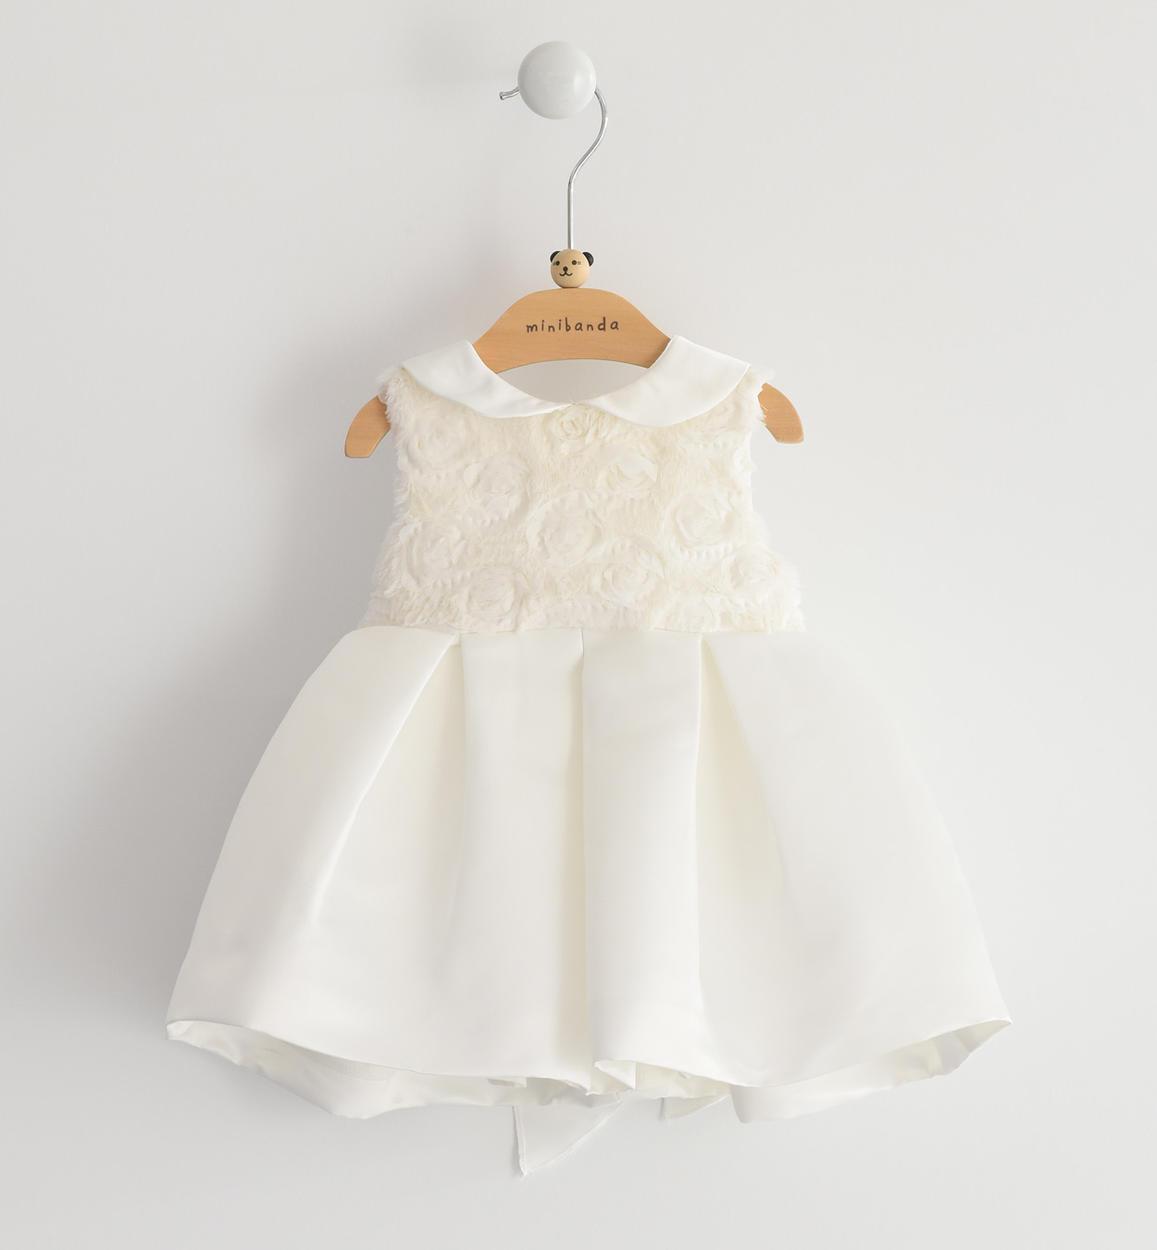 Vestiti Cerimonia Bambina 9 Mesi.Elegante Vestito Neonata Da Cerimonia Per Neonata Da 0 A 24 Mesi